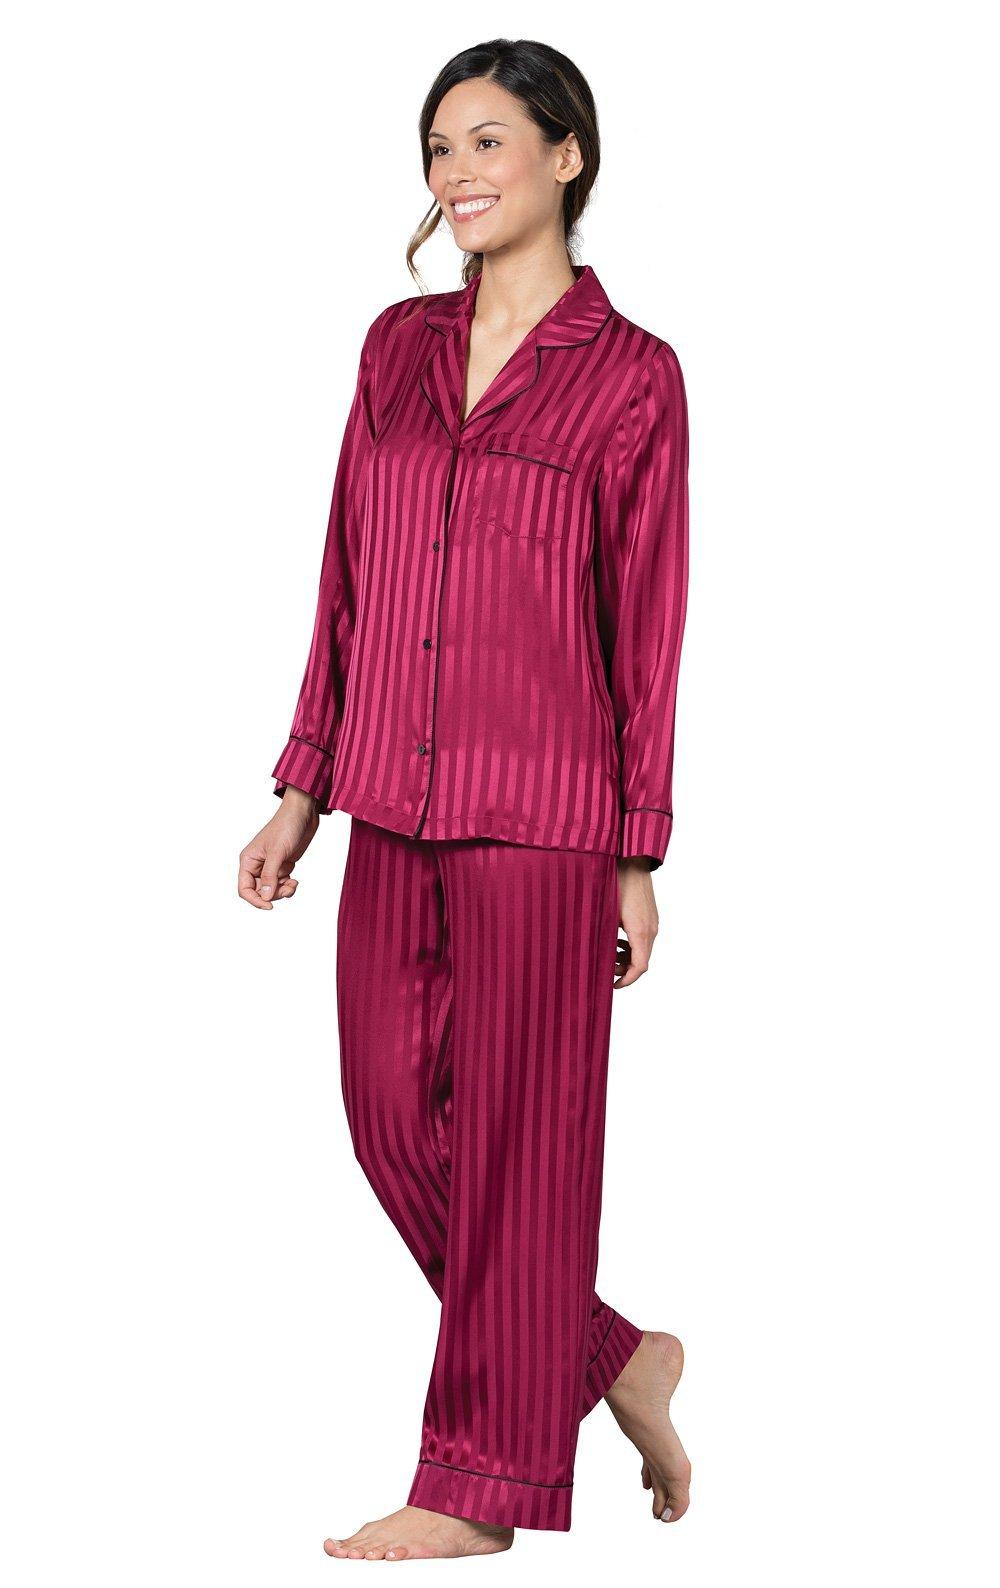 PajamaGram Striped Silk Button-Front Women's Pajamas, Merlot, Med (8-10)